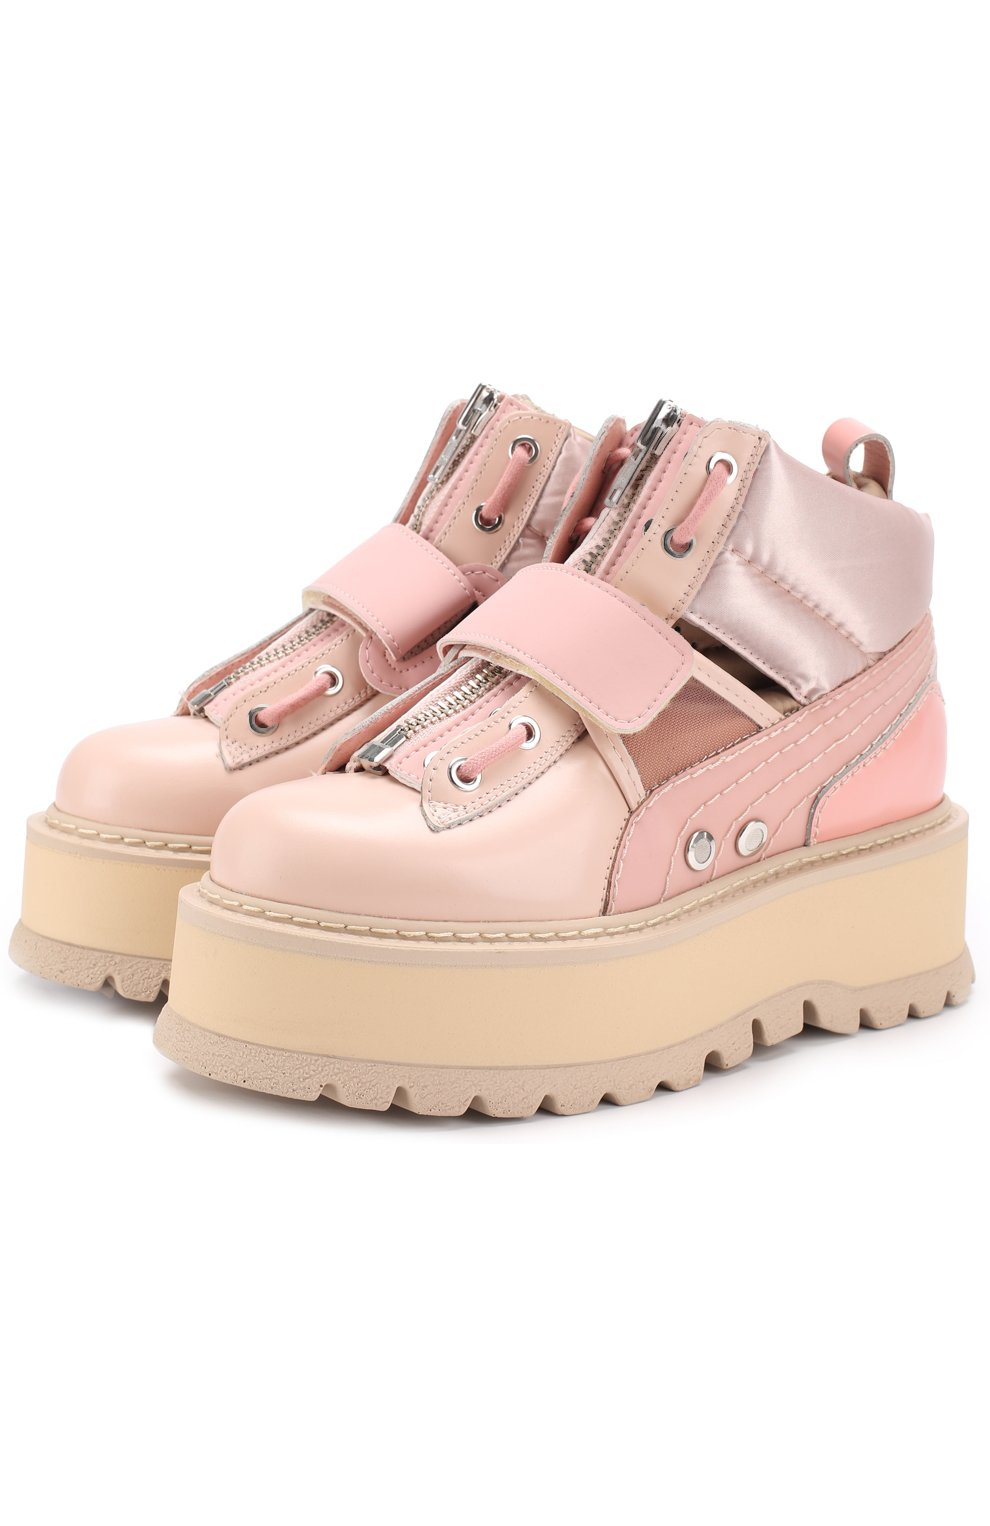 0f7e936d8c07 Женские розовые ботинки на платформе fenty x puma by rihanna FENTY ...